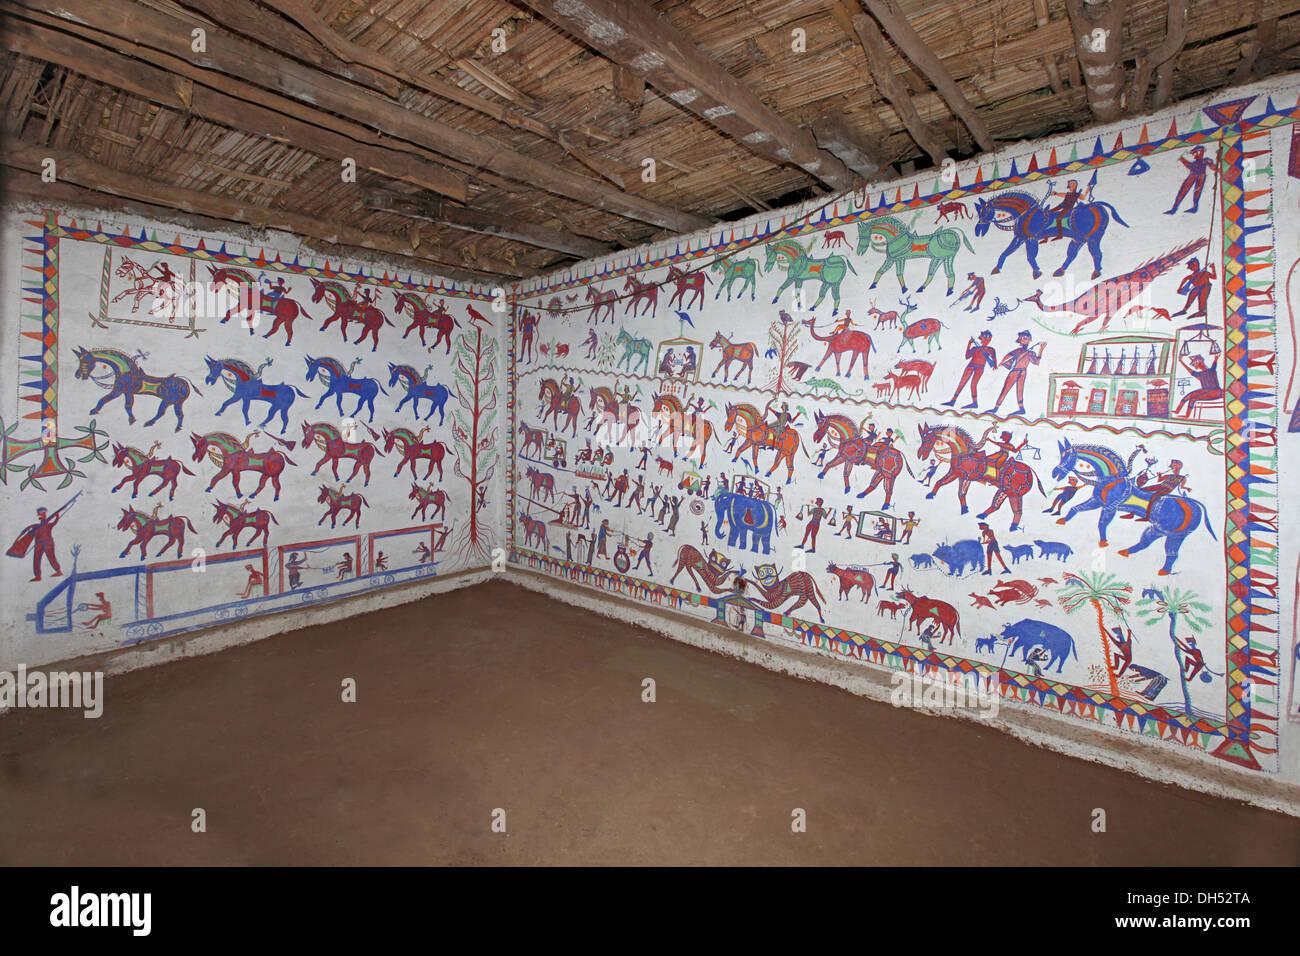 Tribali dipinti a muro (pithola pittura), tribù Bhil, Madhya Pradesh, India Immagini Stock